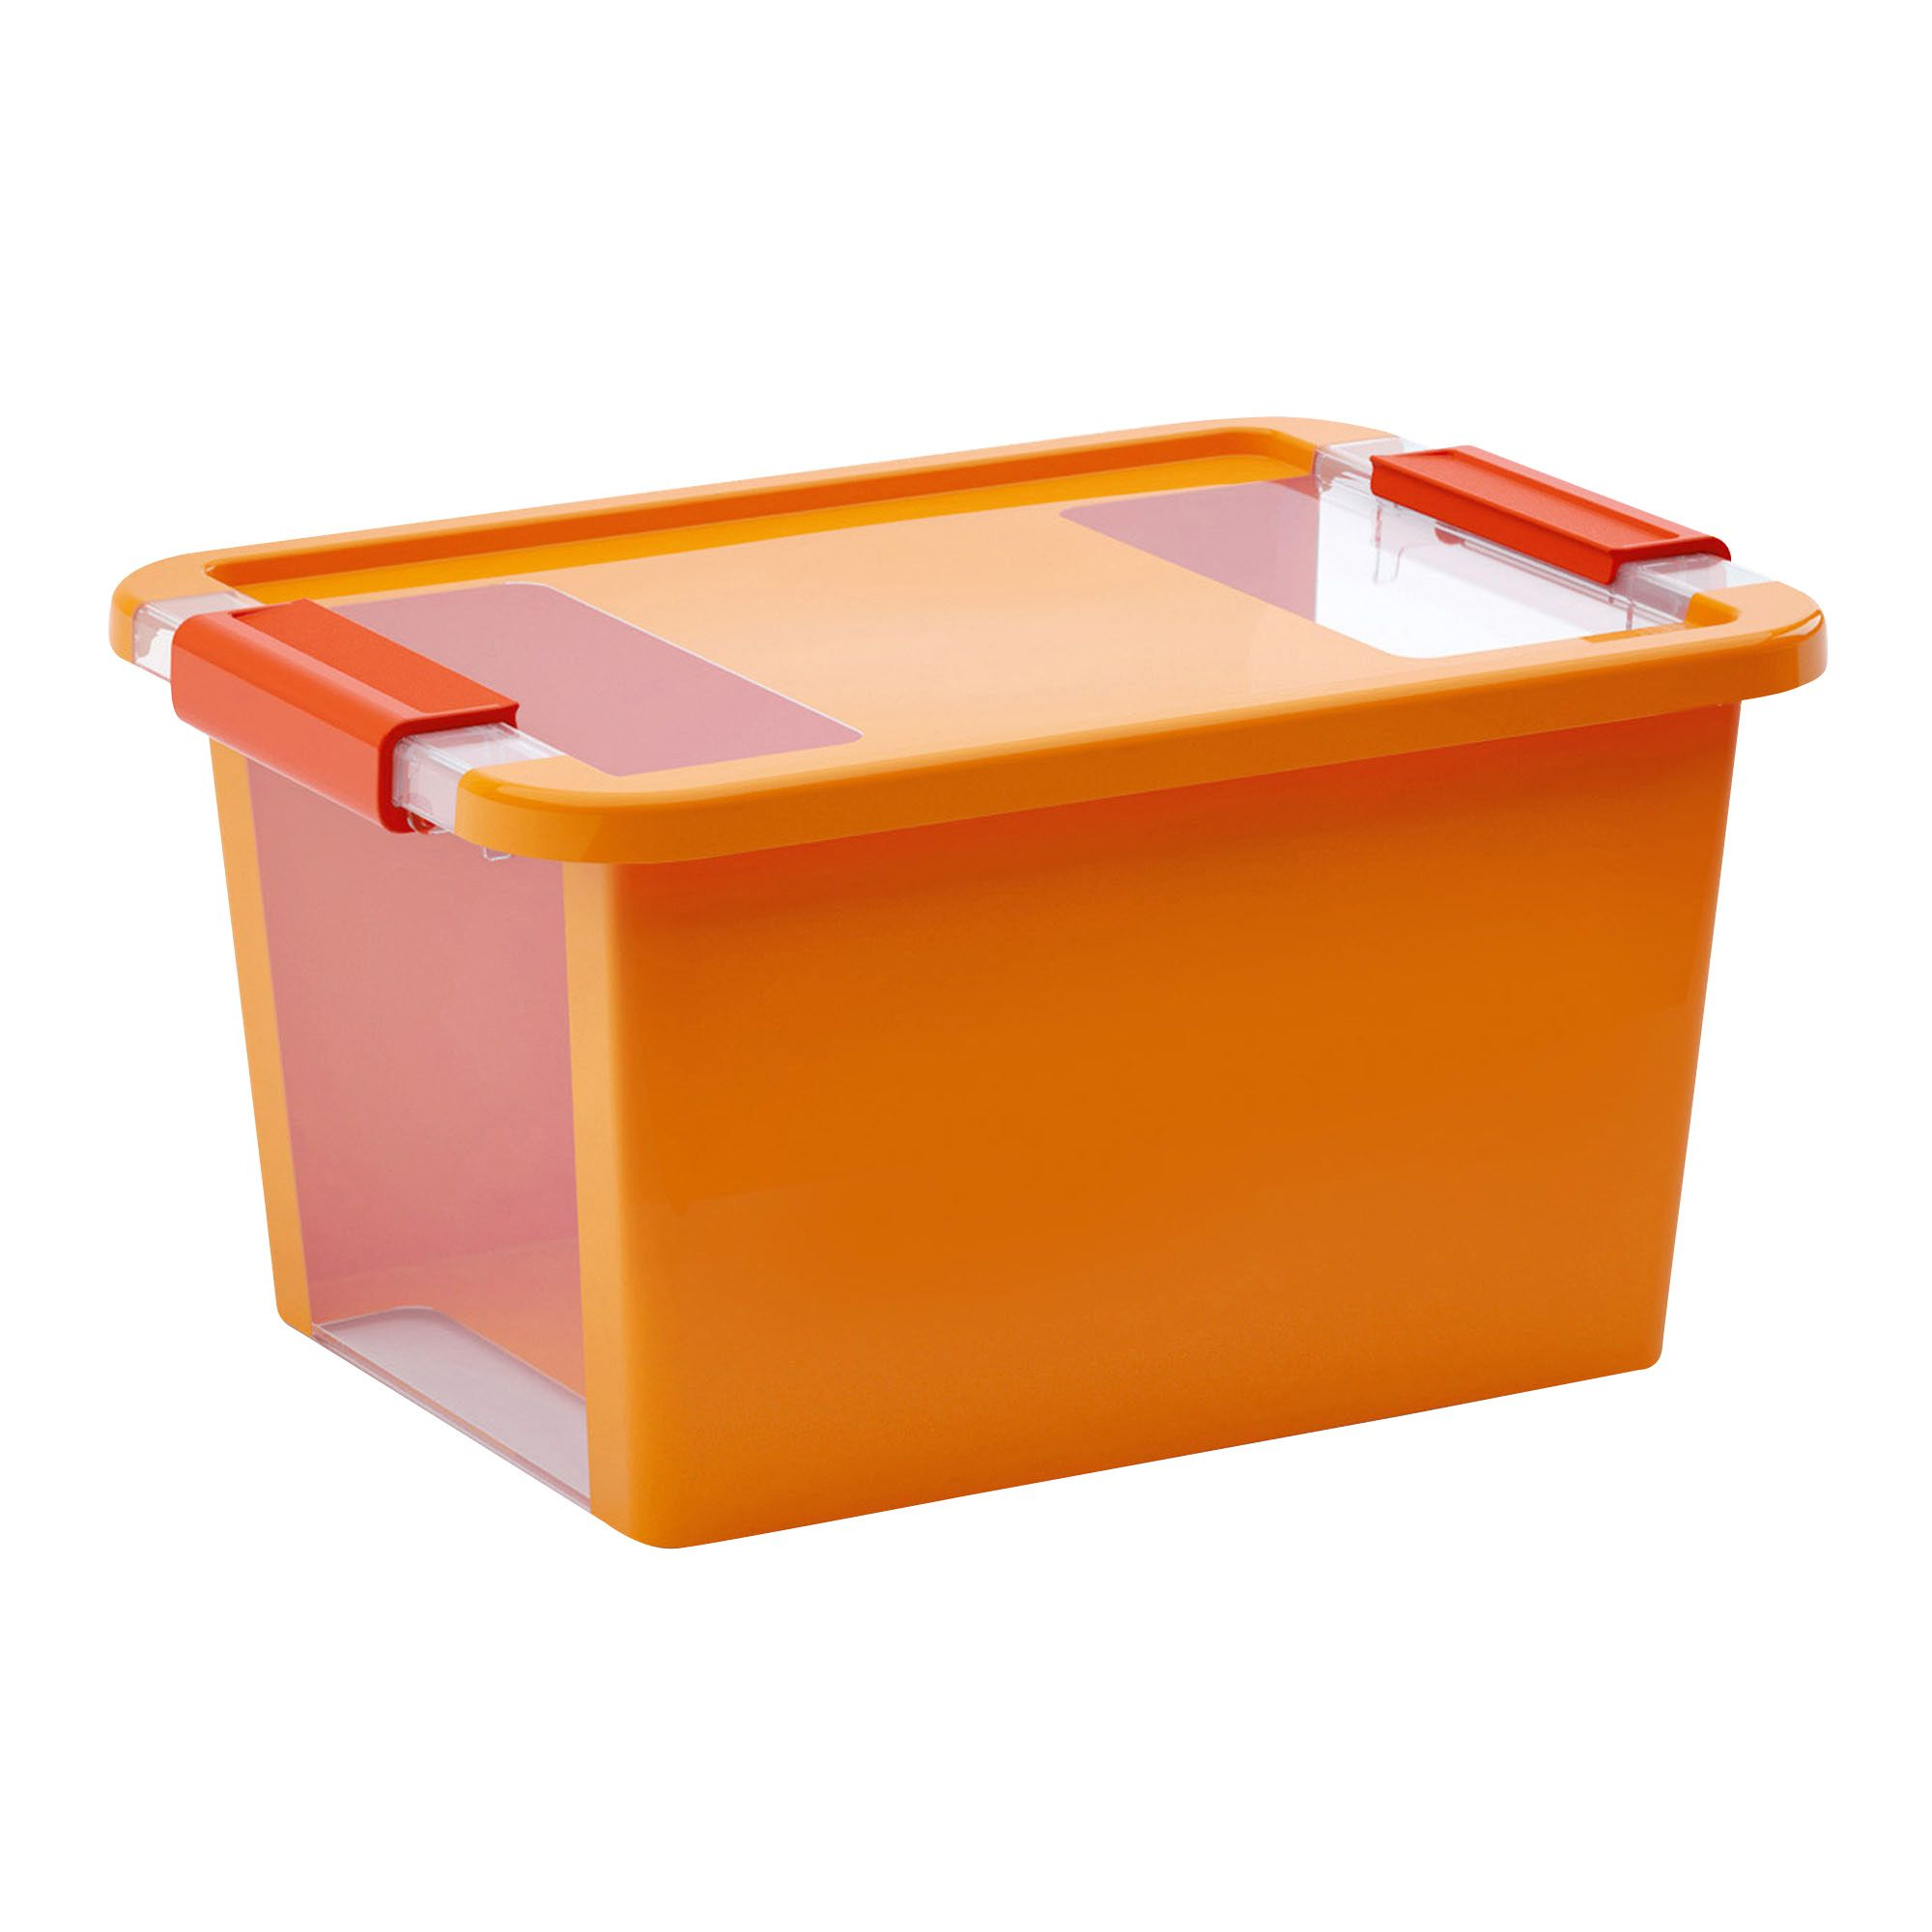 sc 1 st  Bu0026Q & Kis Bi Box Orange 40L Plastic Storage Box | Departments | DIY at Bu0026Q